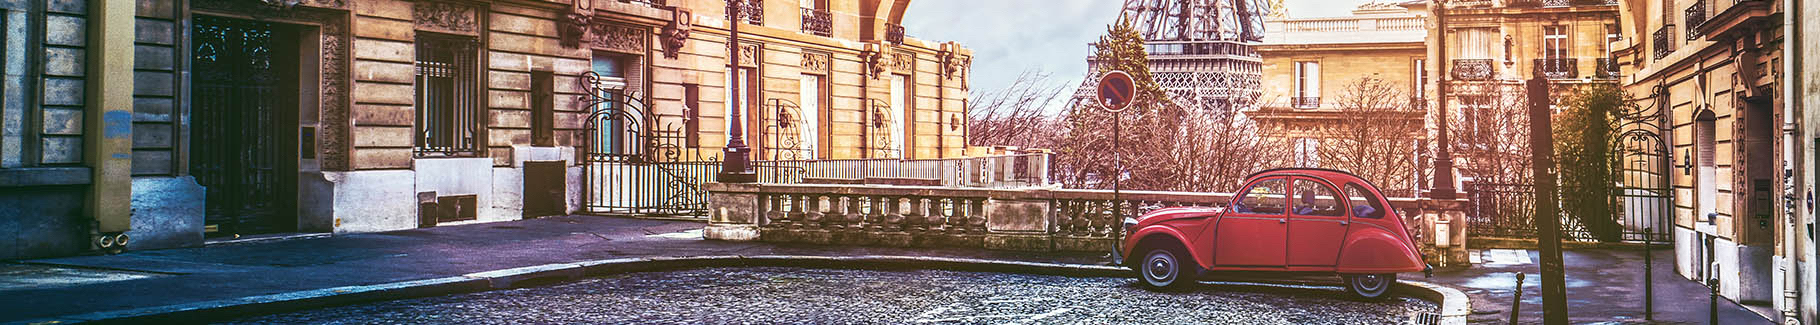 Fototapeta ulica Paryża